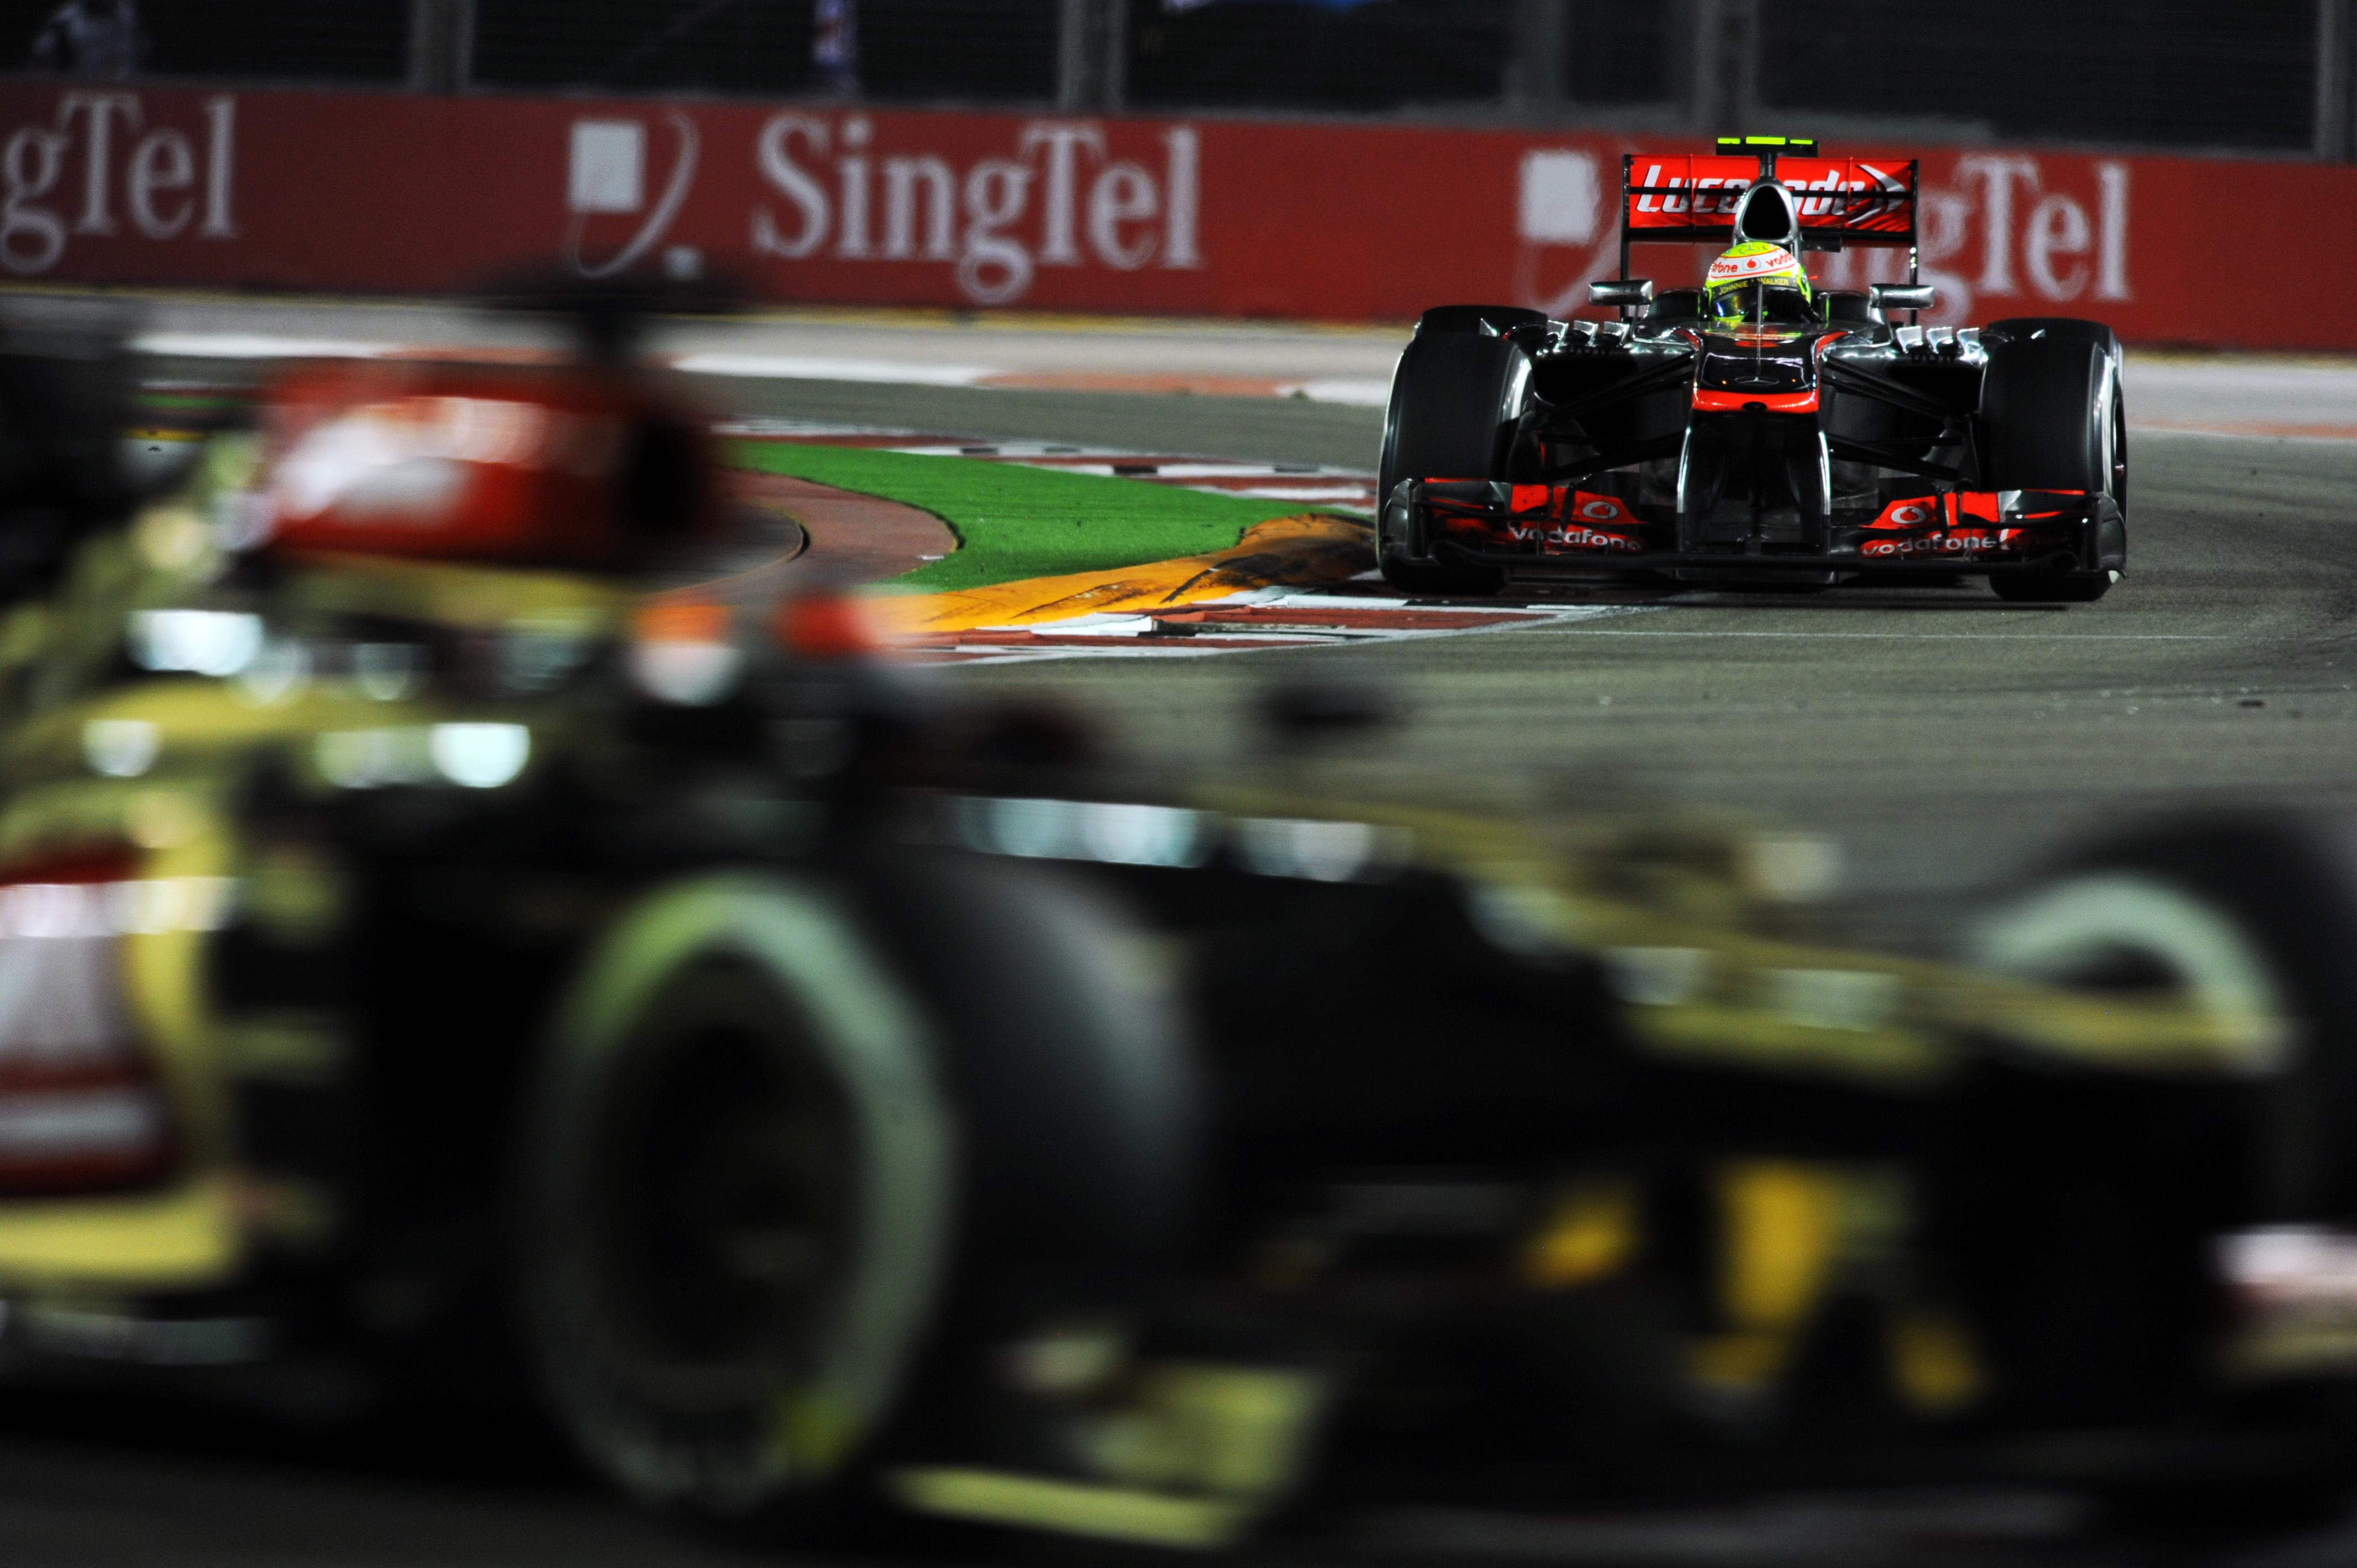 Motor Racing Formula One World Championship Singapore Grand Prix Race Day Singapore, Singapore